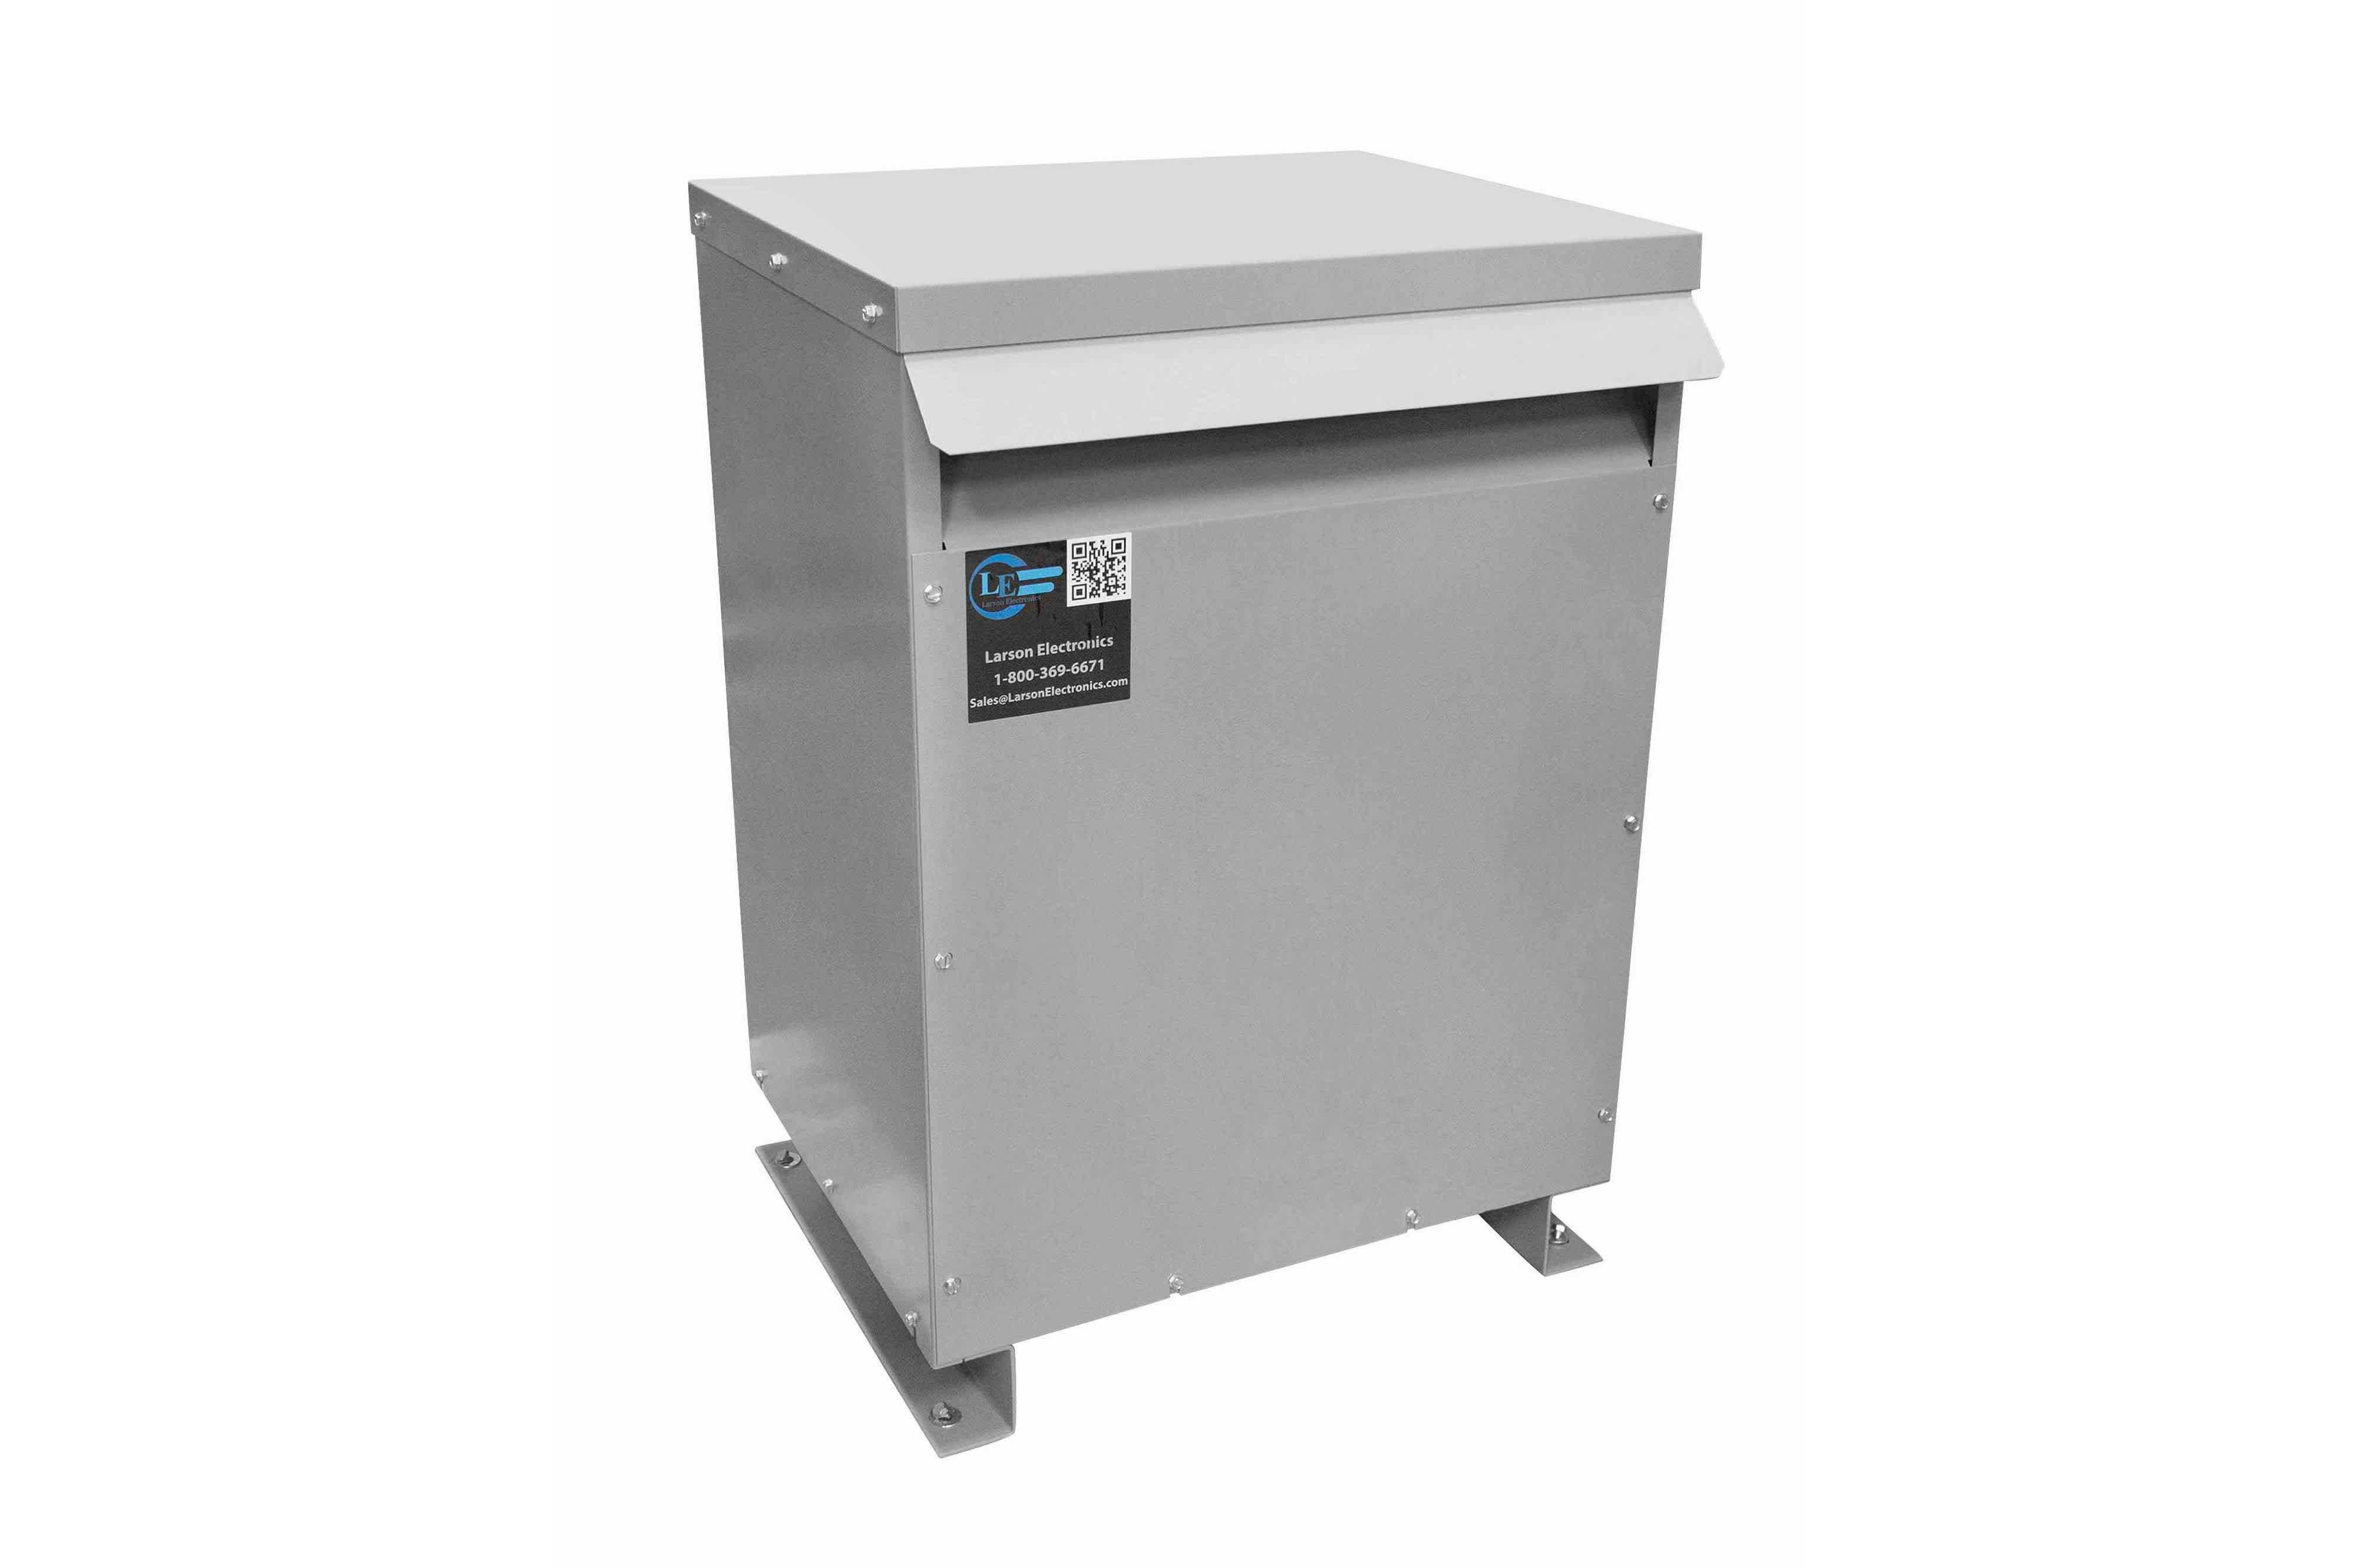 112.5 kVA 3PH Isolation Transformer, 415V Wye Primary, 208Y/120 Wye-N Secondary, N3R, Ventilated, 60 Hz